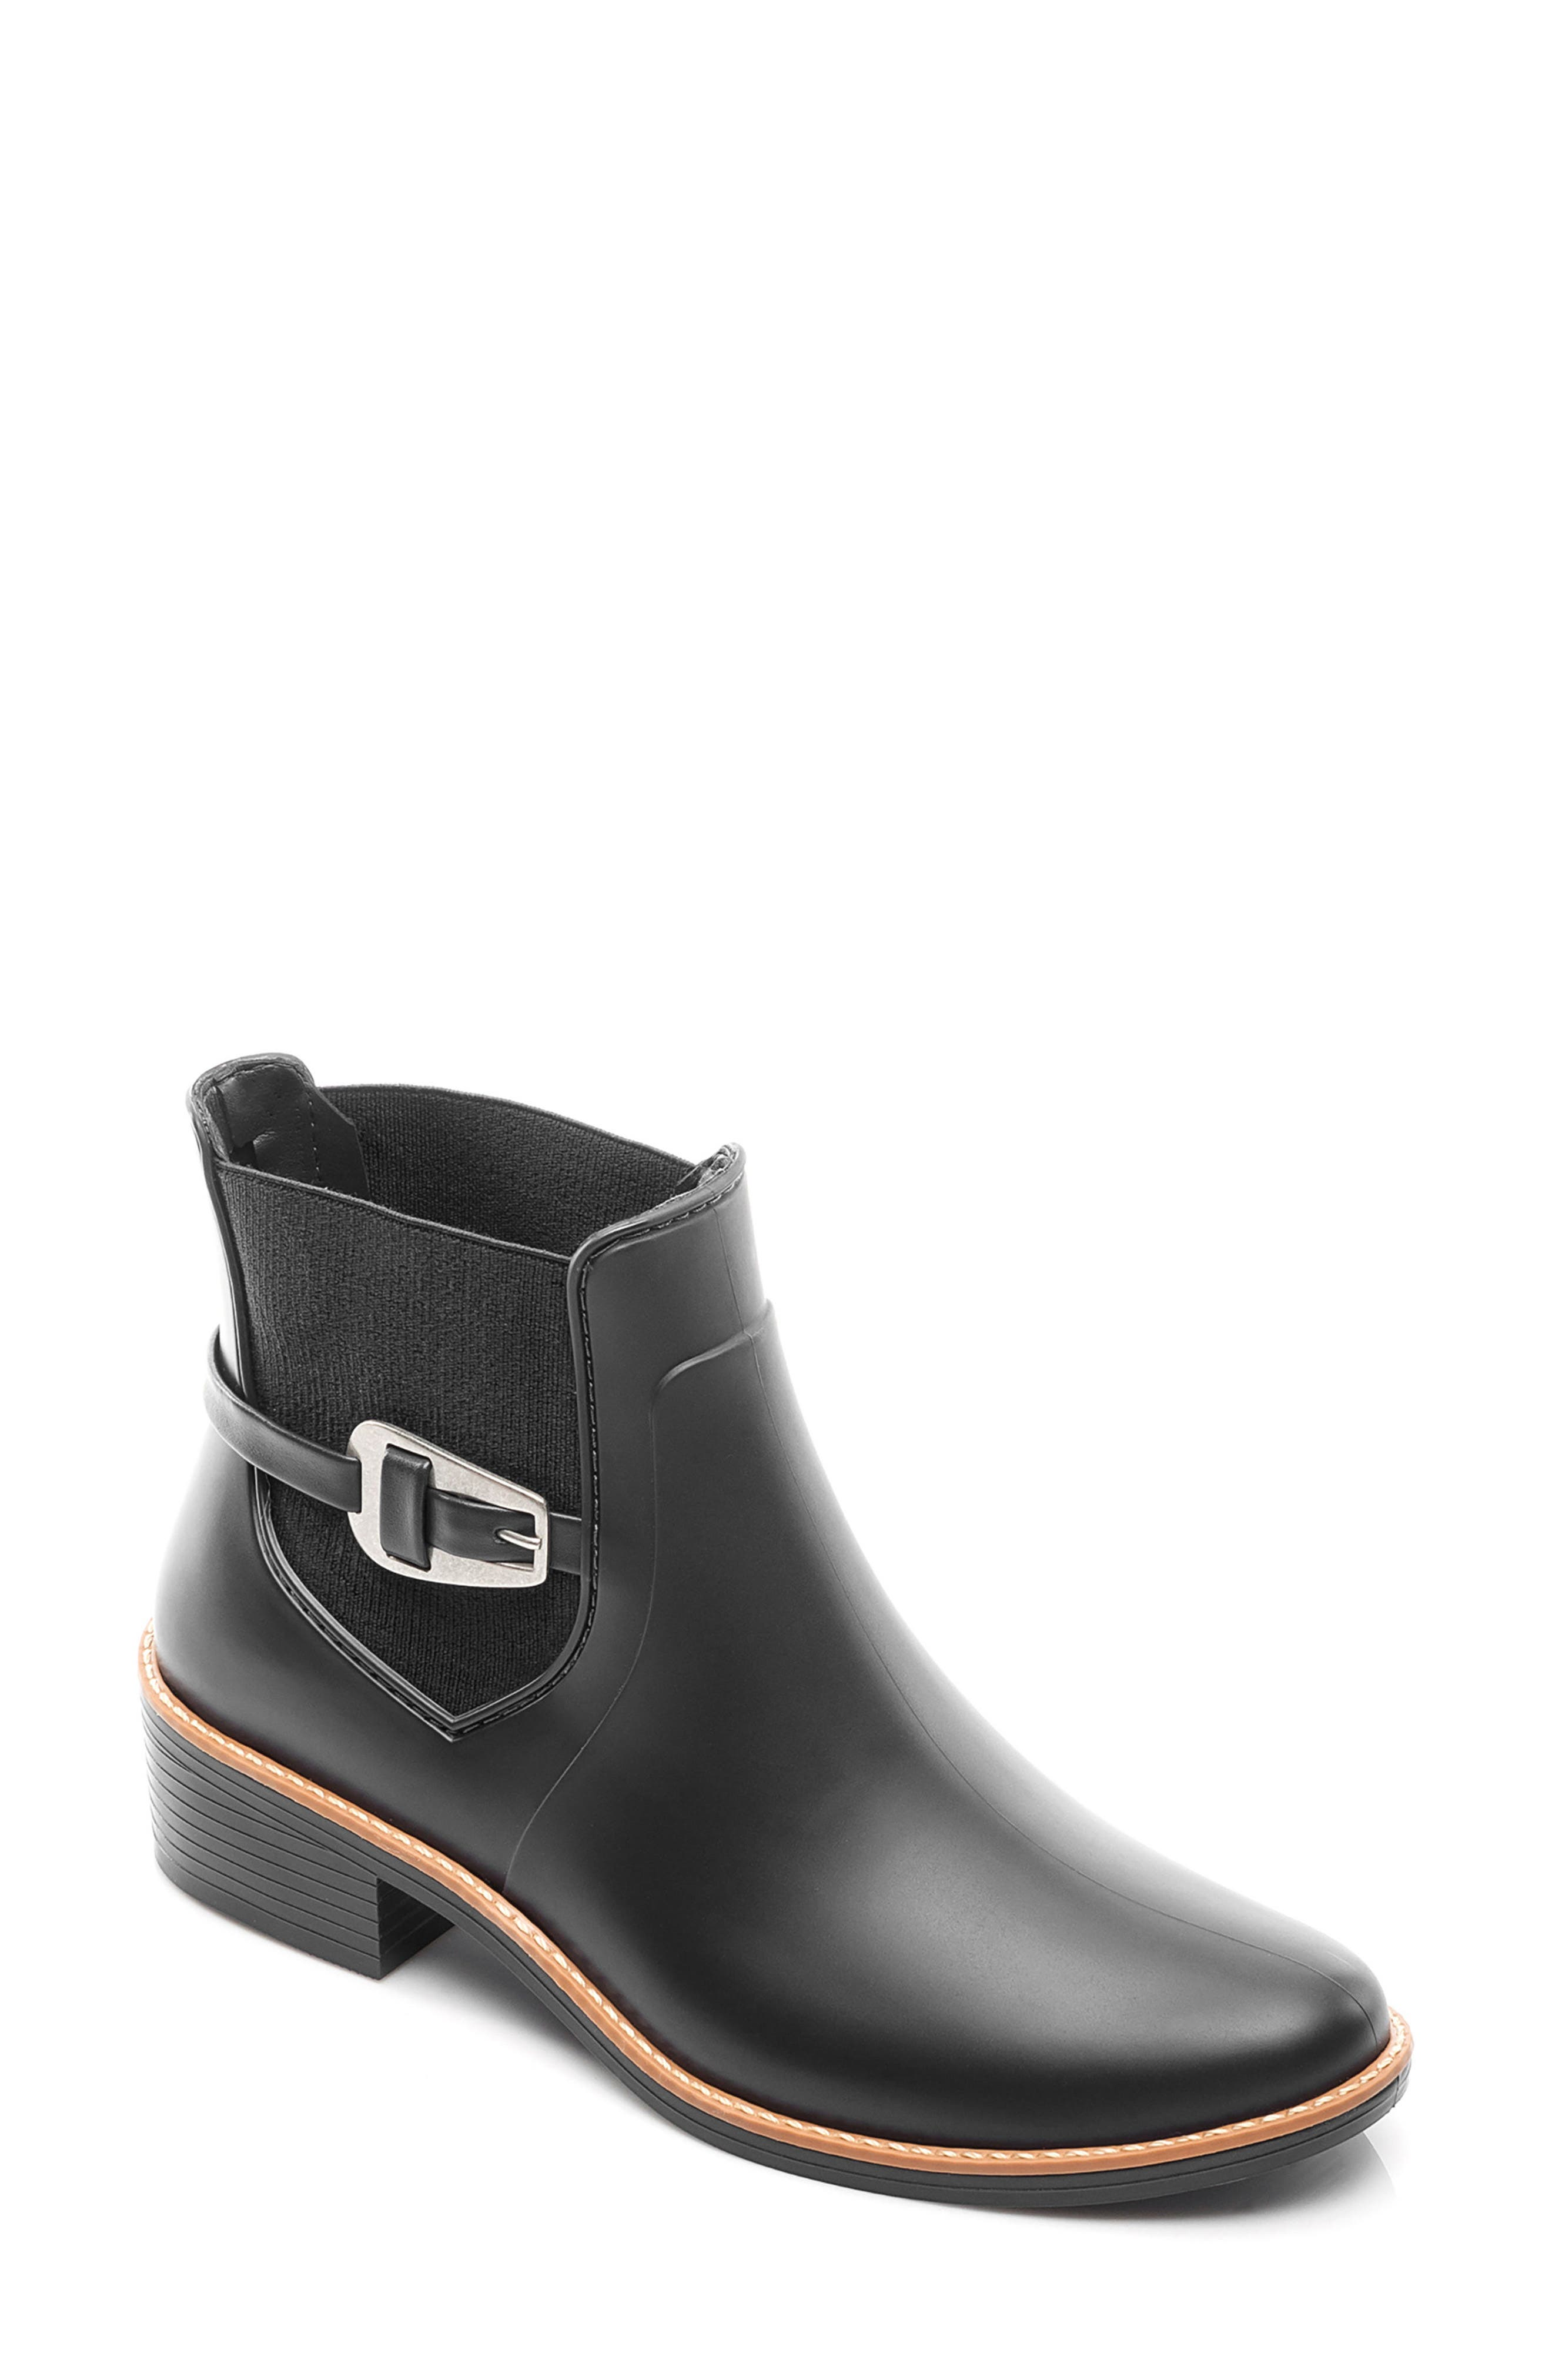 Main Image - Bernardo Footwear Pansie Rain Boot (Women)